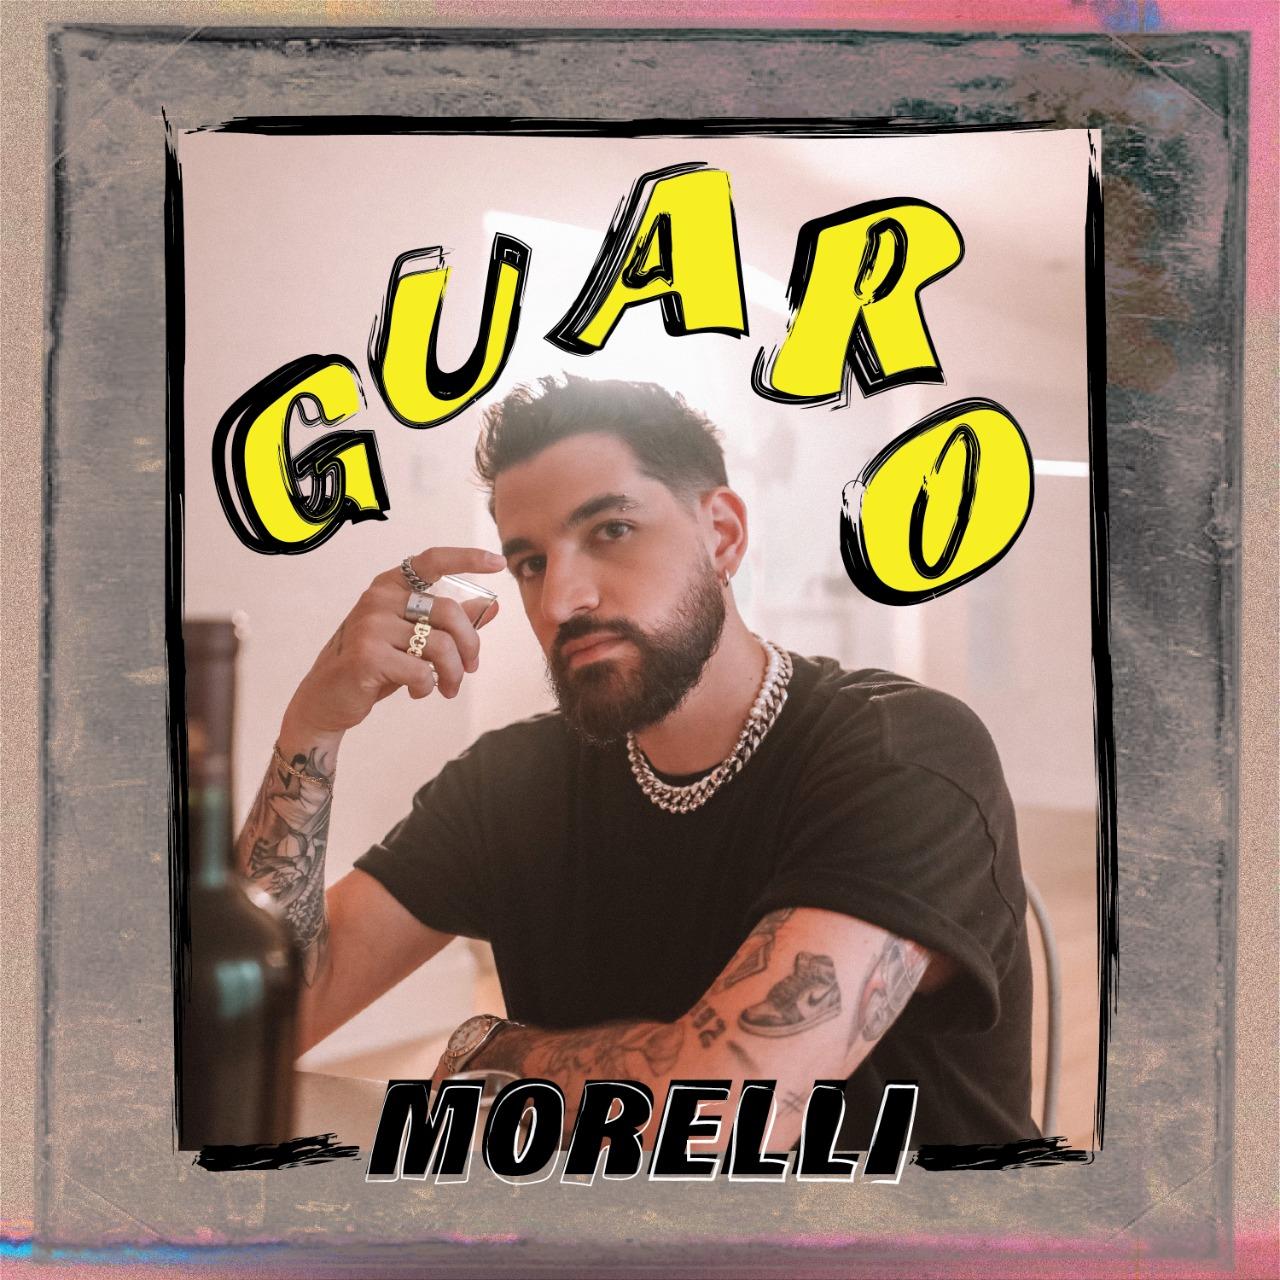 Morelli invita a superar las penas con 'Guaro', su nuevo sencillo